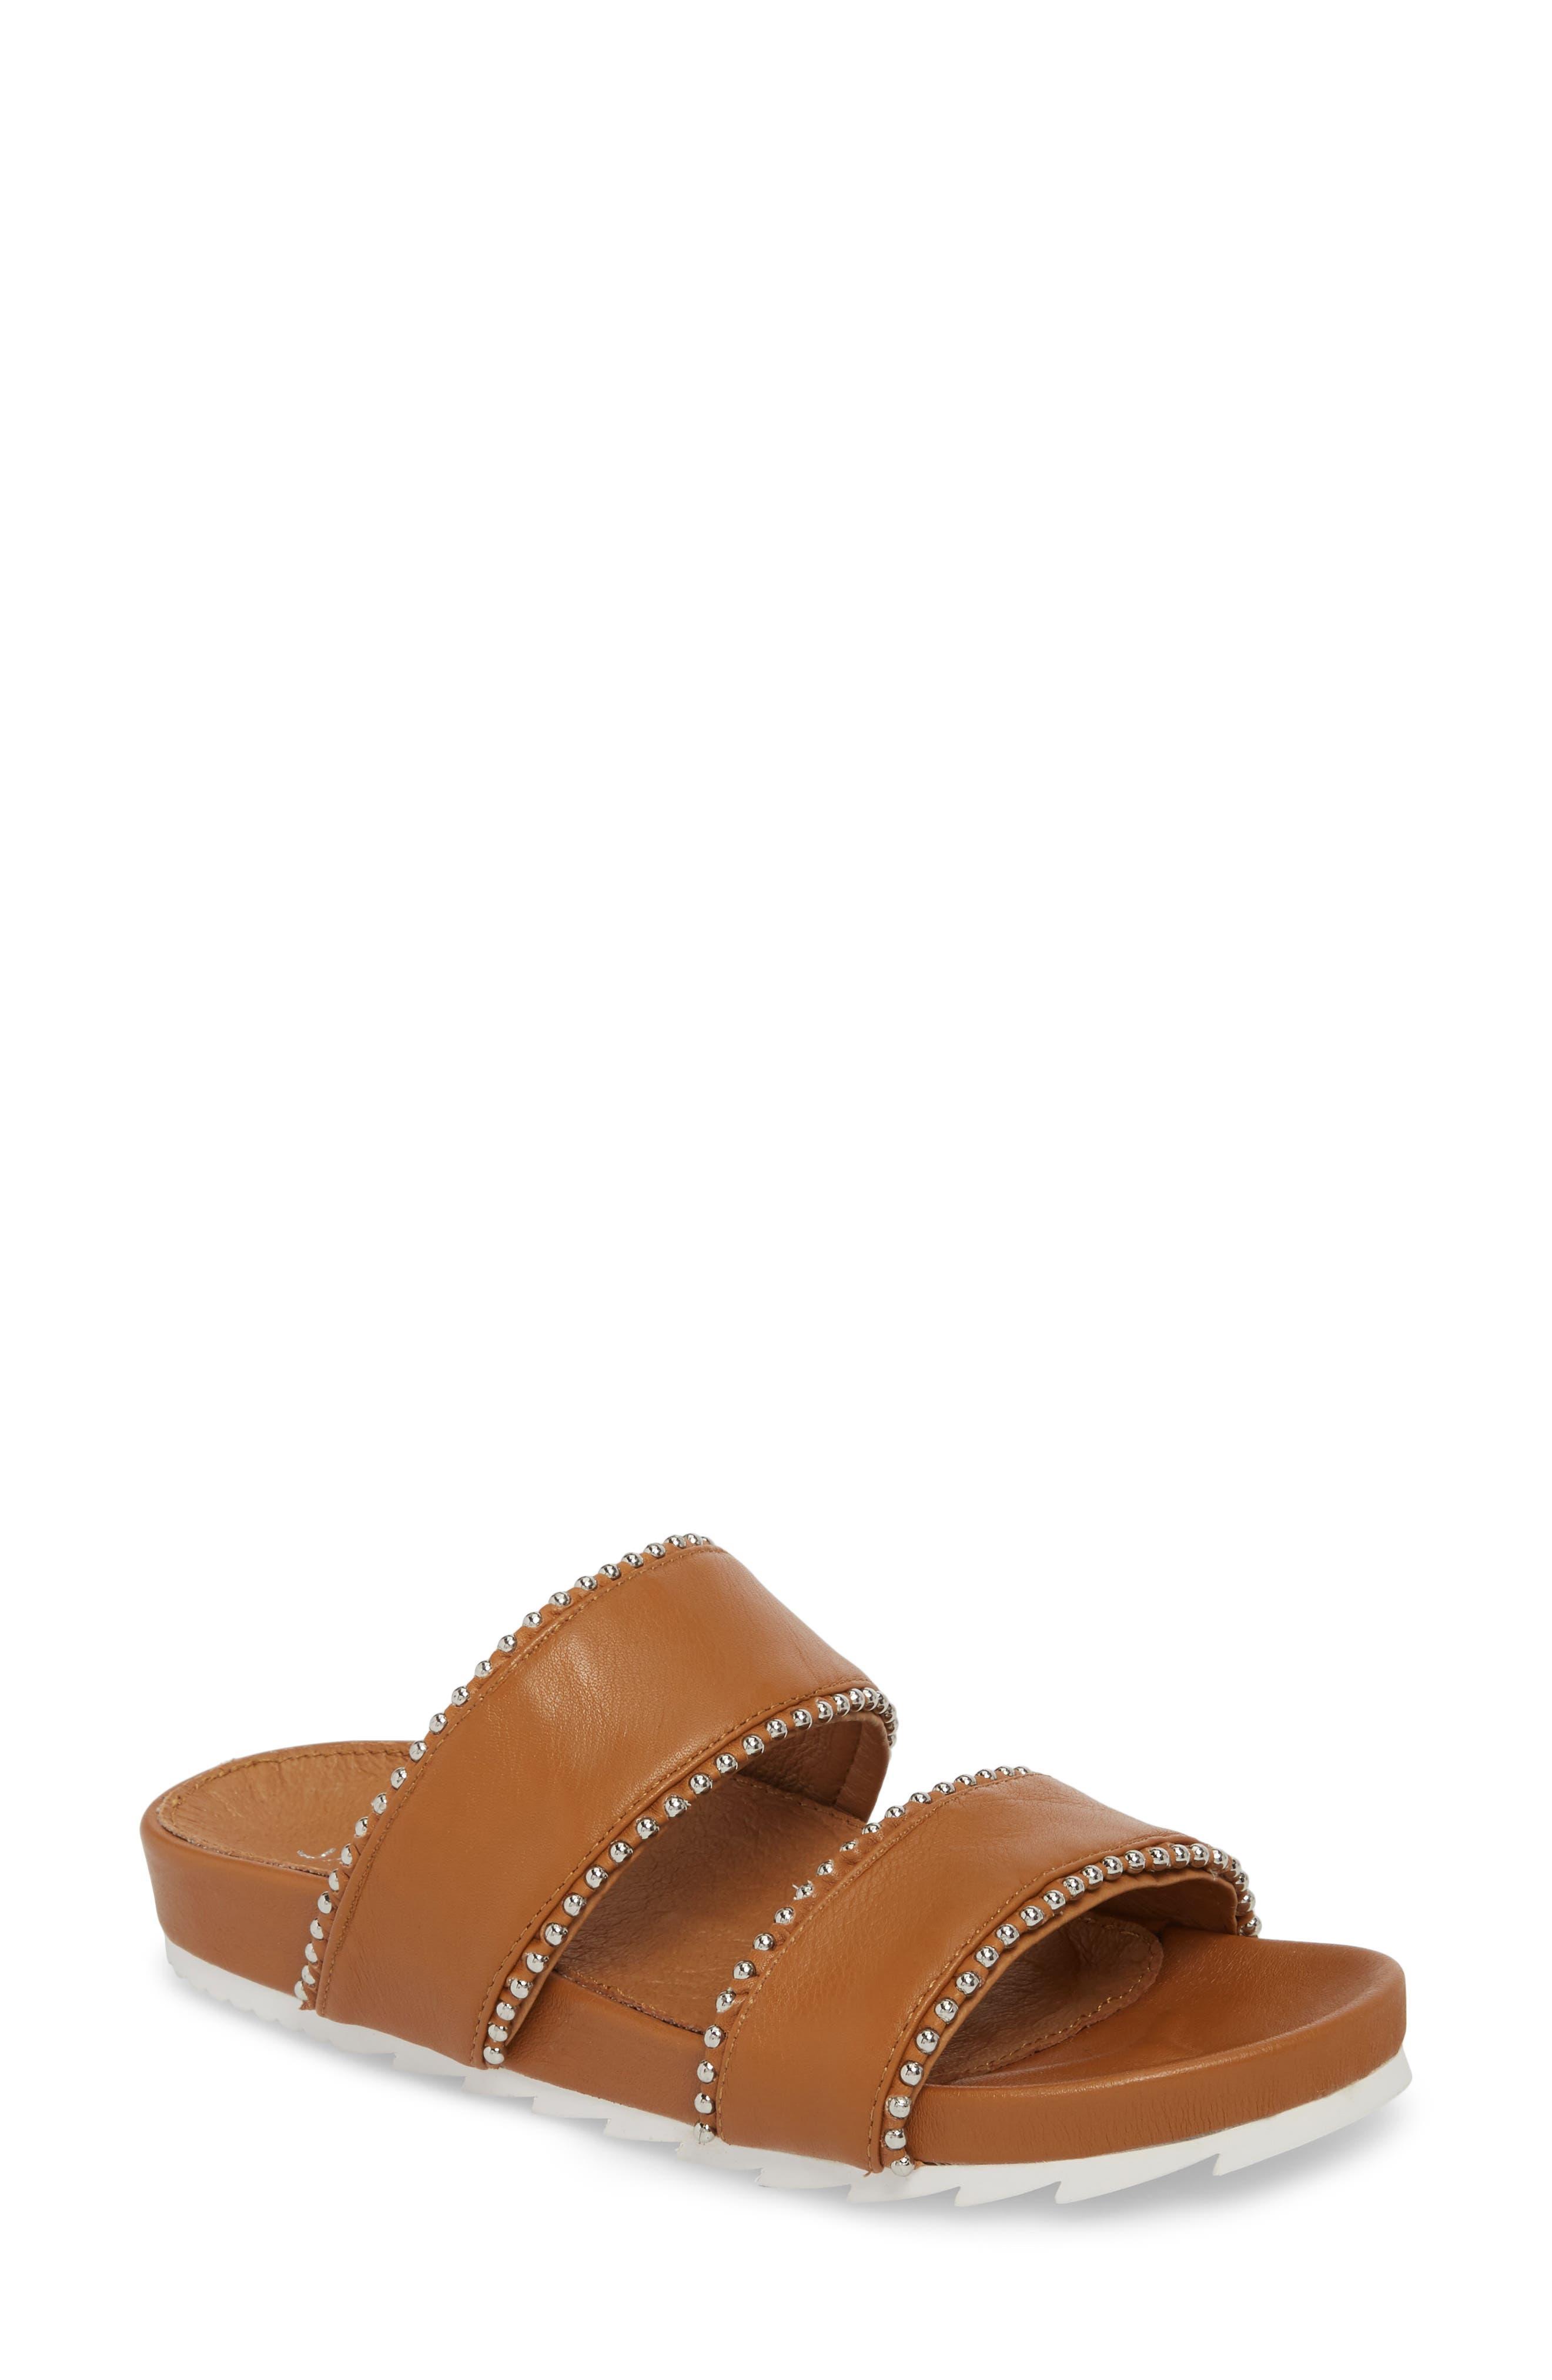 Emmie Bead Chain Slide Sandal,                         Main,                         color, TAN LEATHER